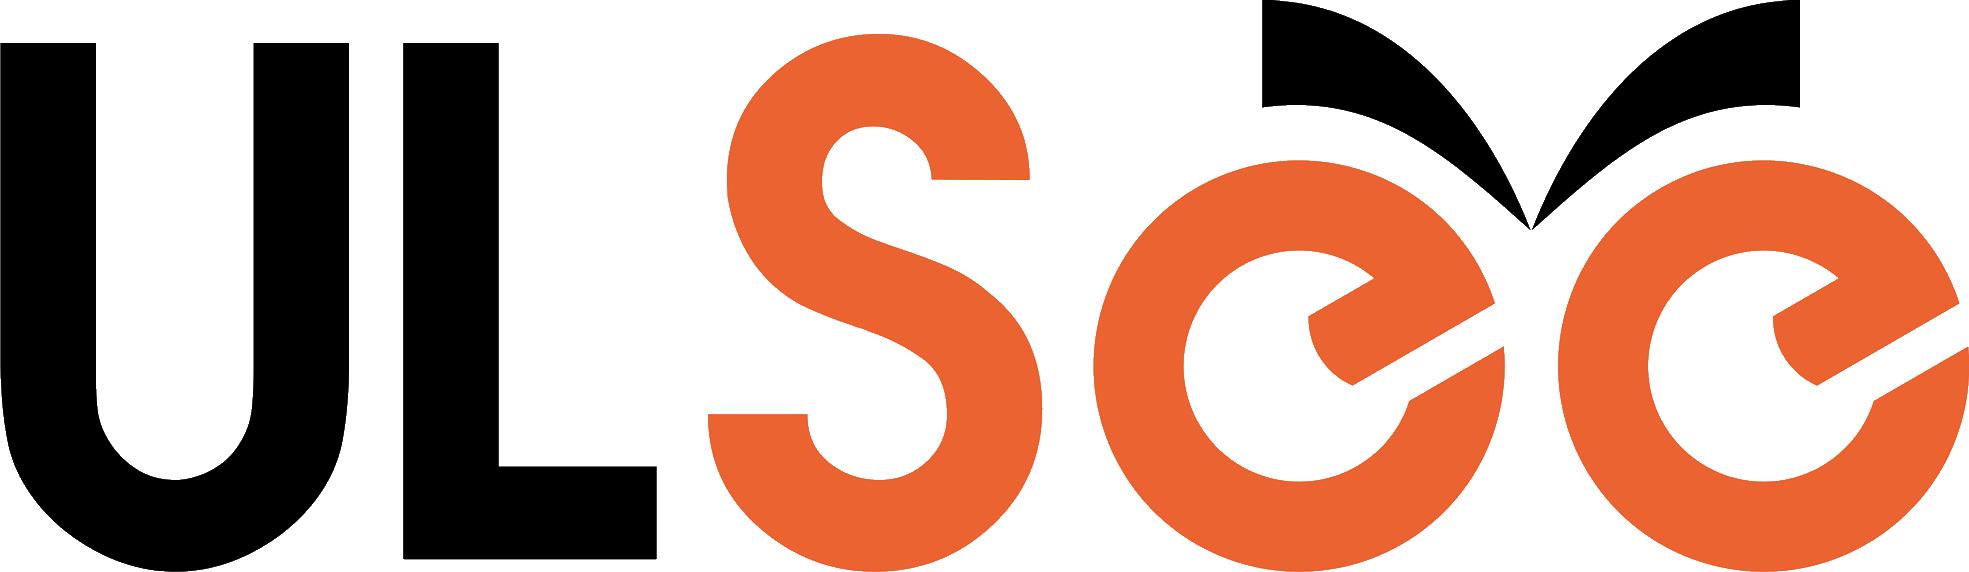 Логотип компании «ULSee»